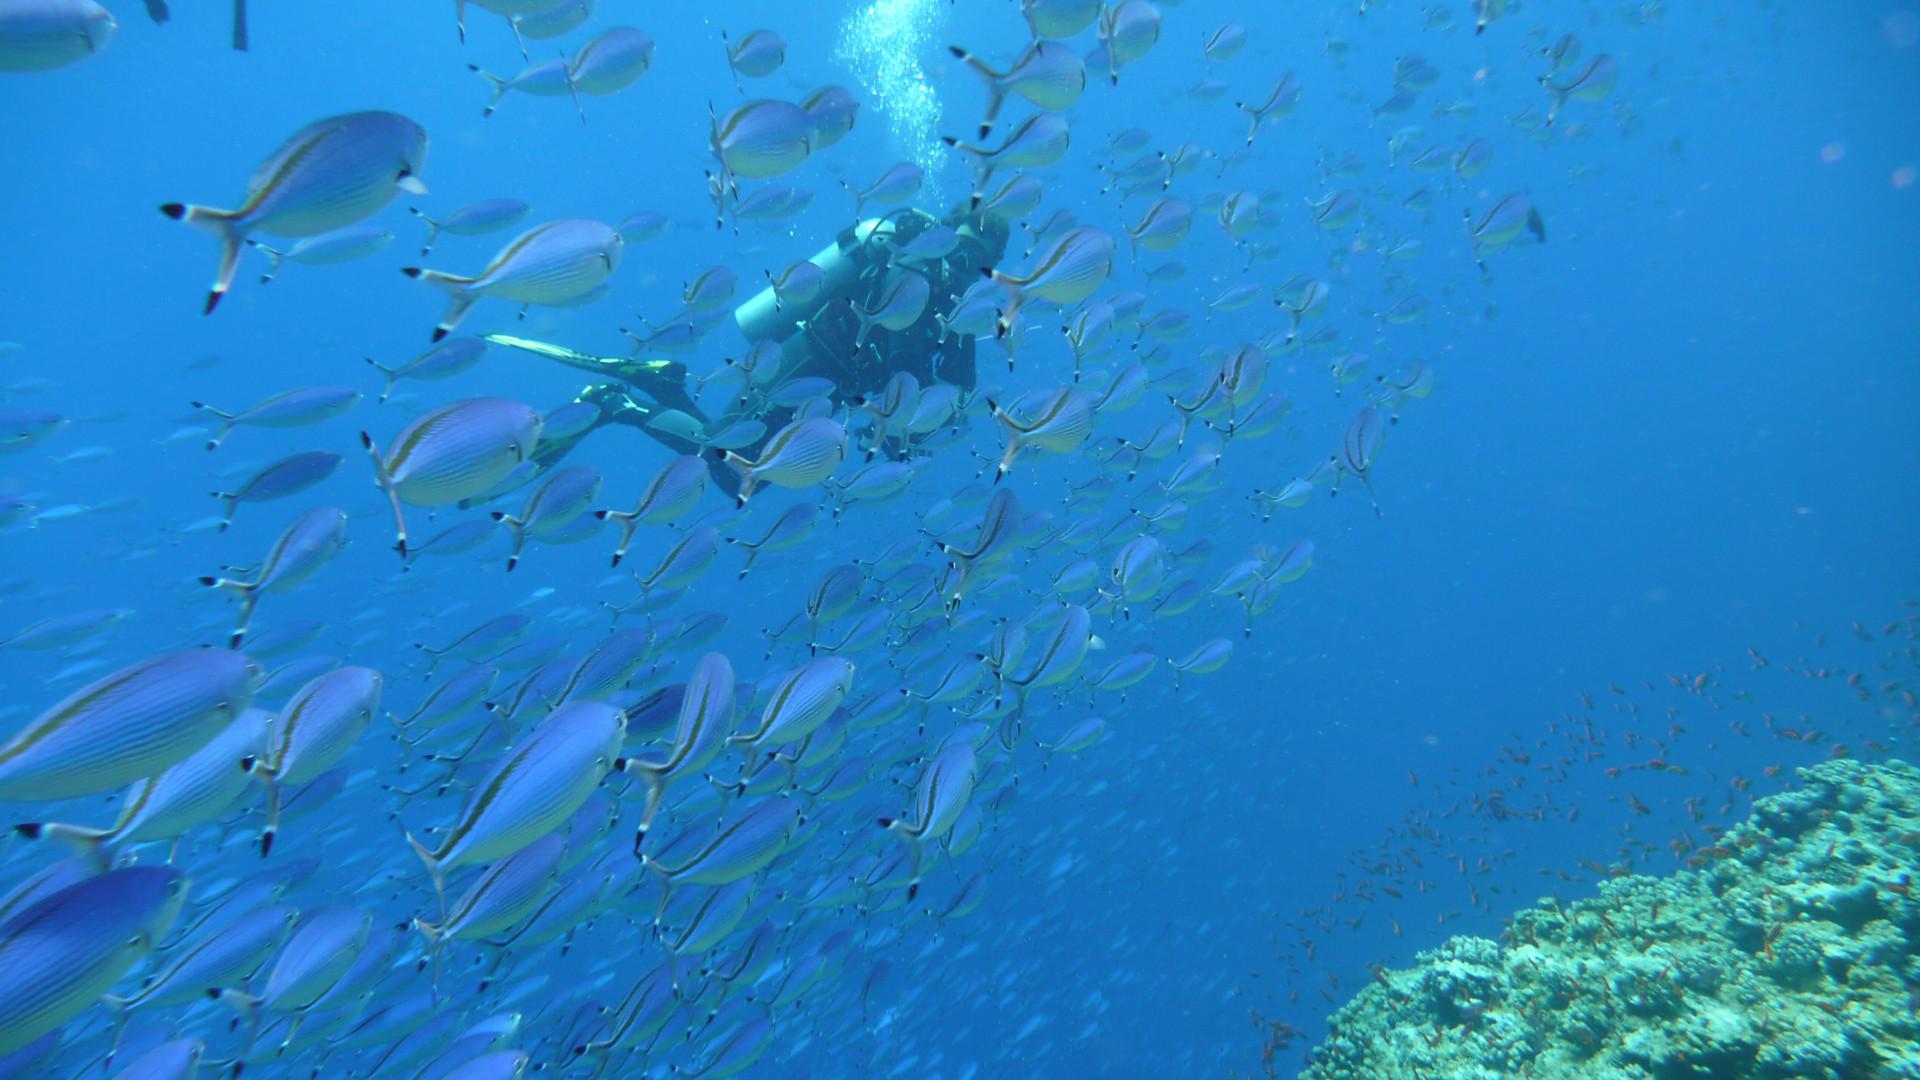 Urlaub 2014, Marsa Alam, Ägypten, Elphinstone Reef